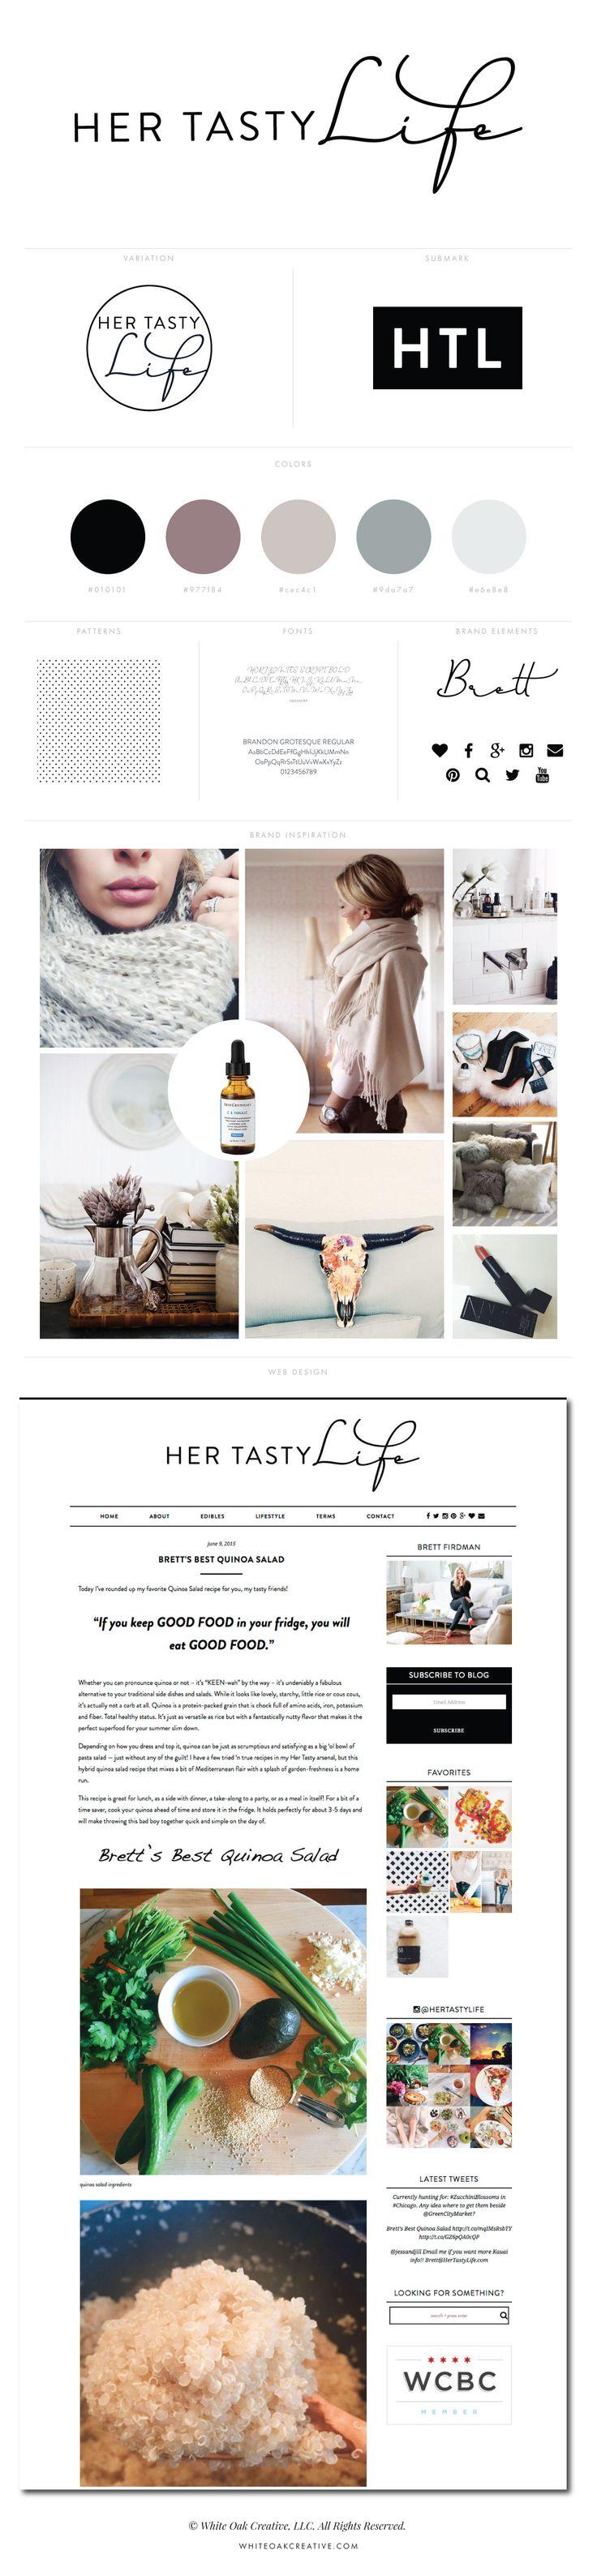 branding and blog design for lifestyle and food blog - logo design, wordpress theme, mood board inspiration, blog design idea, graphic design, branding